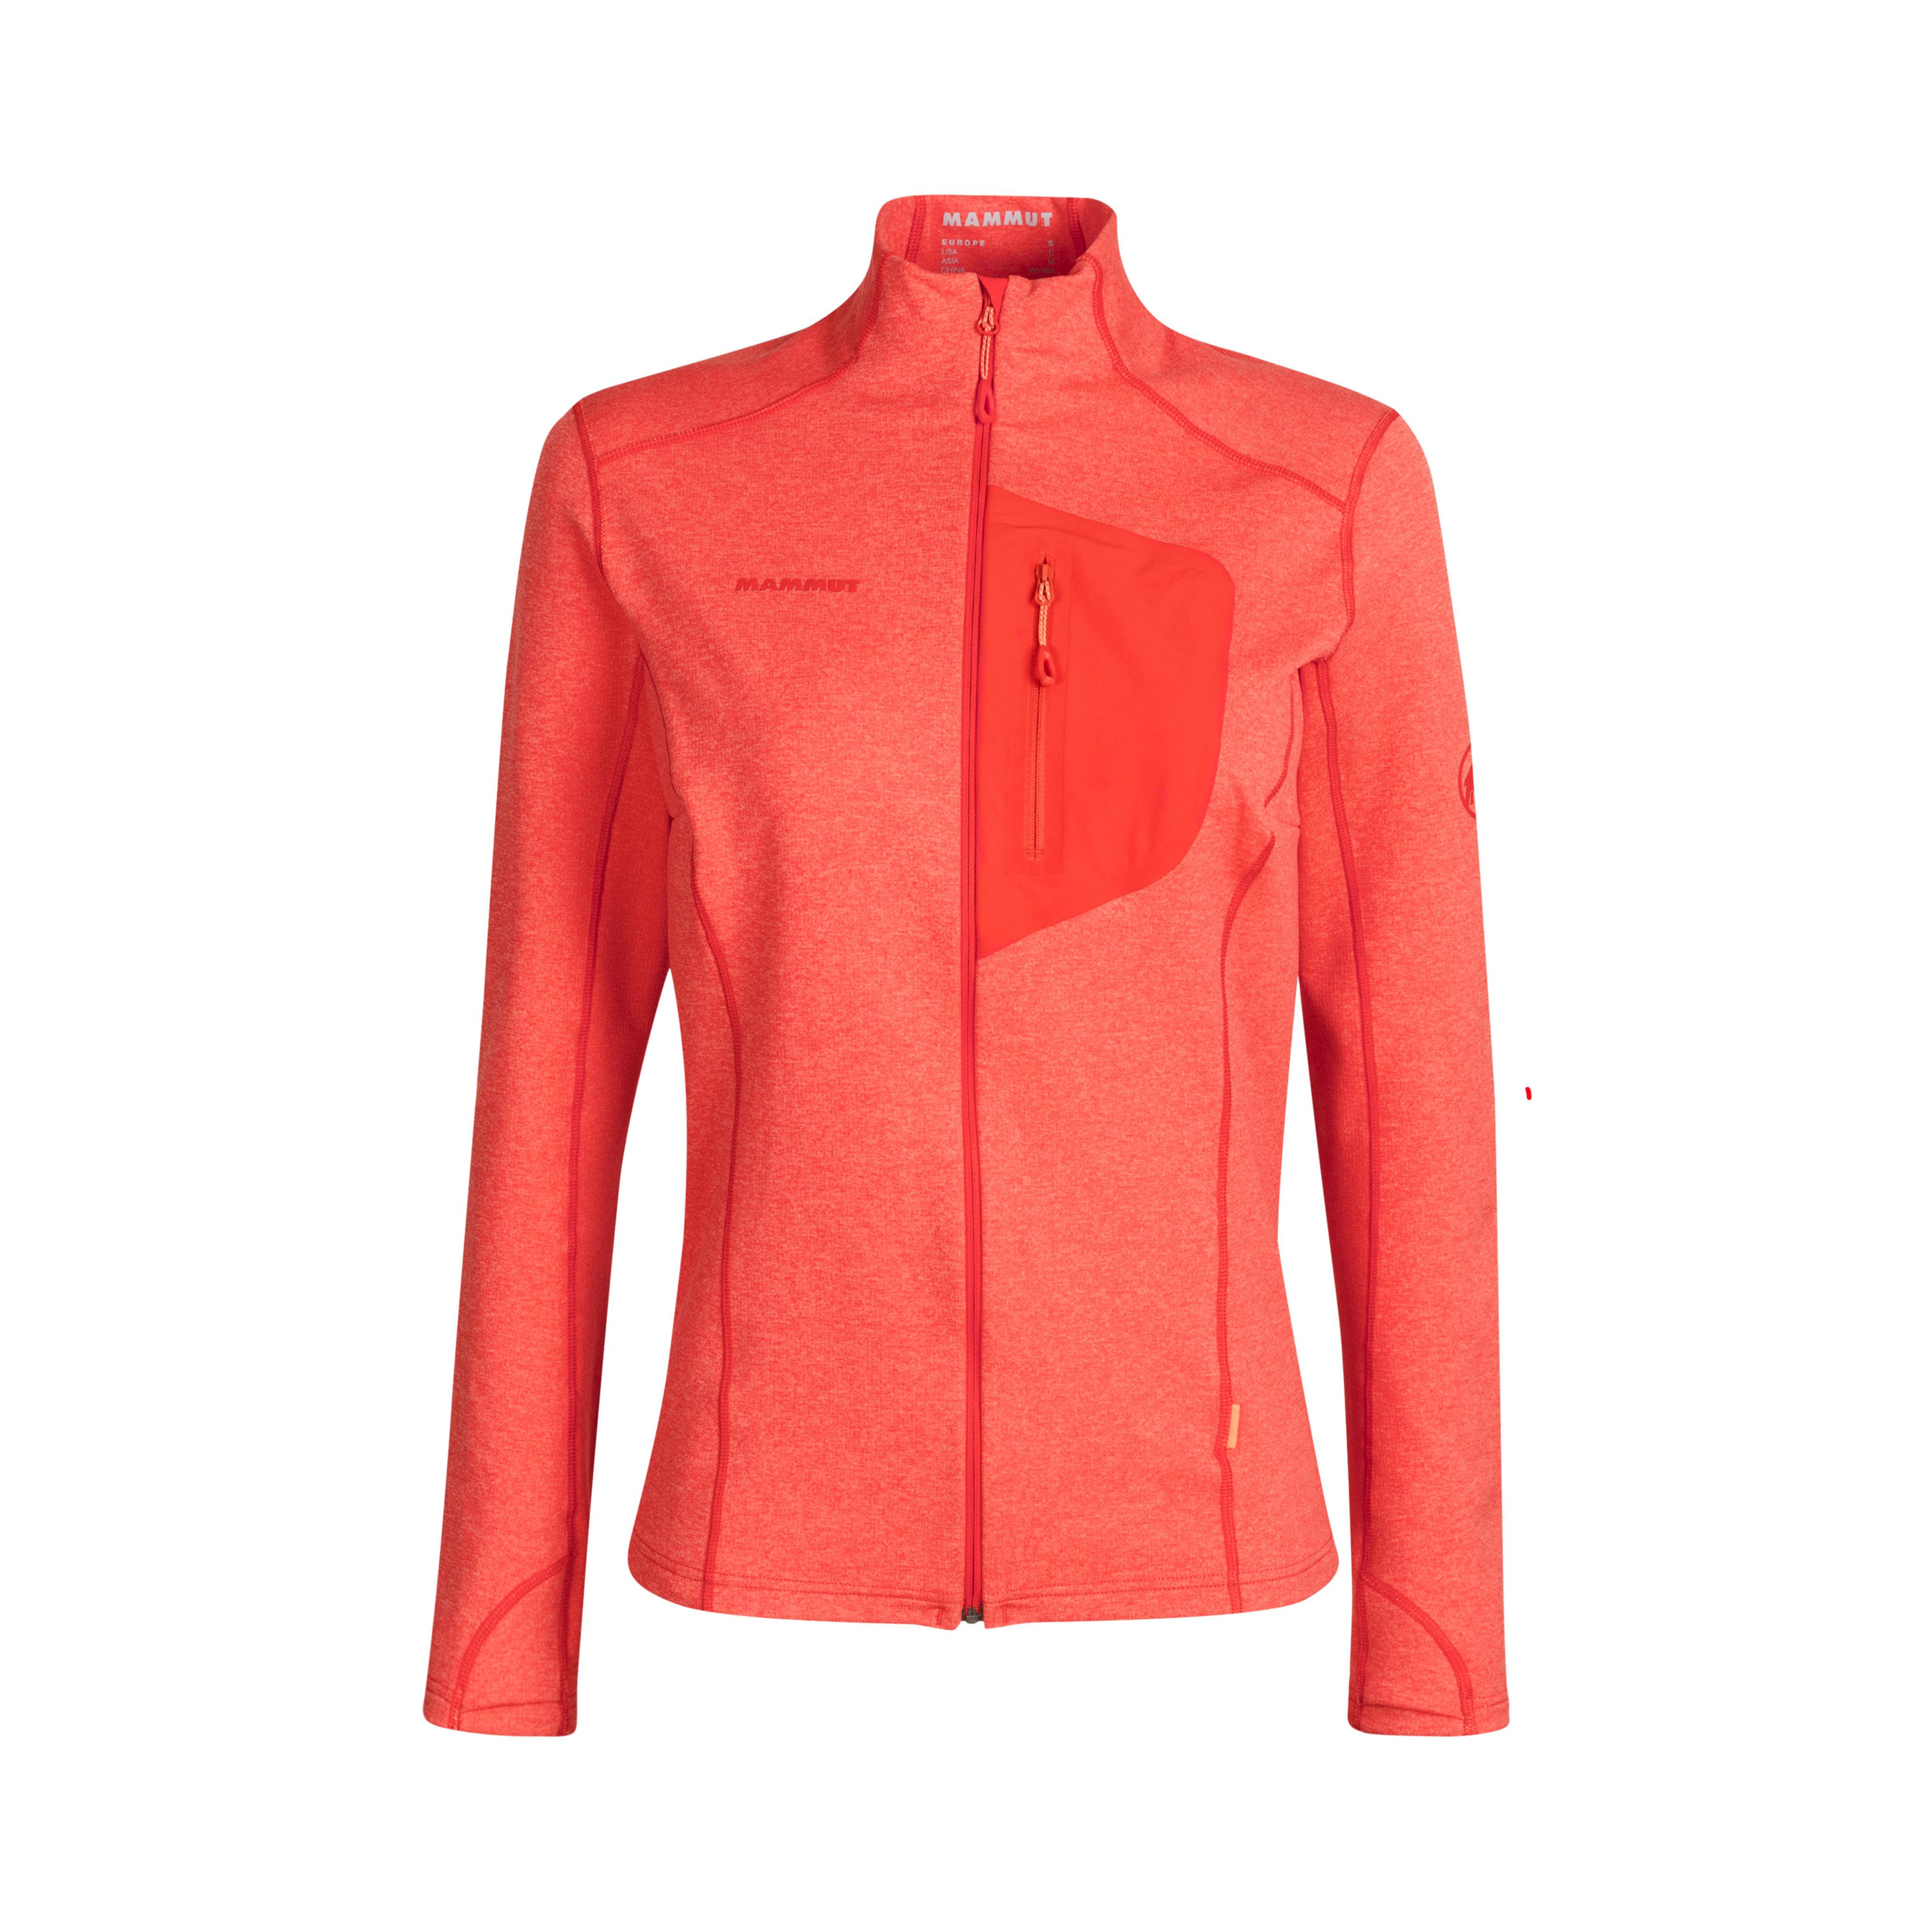 Aconcagua Light ML Jacket Women - poinciana, XS thumbnail